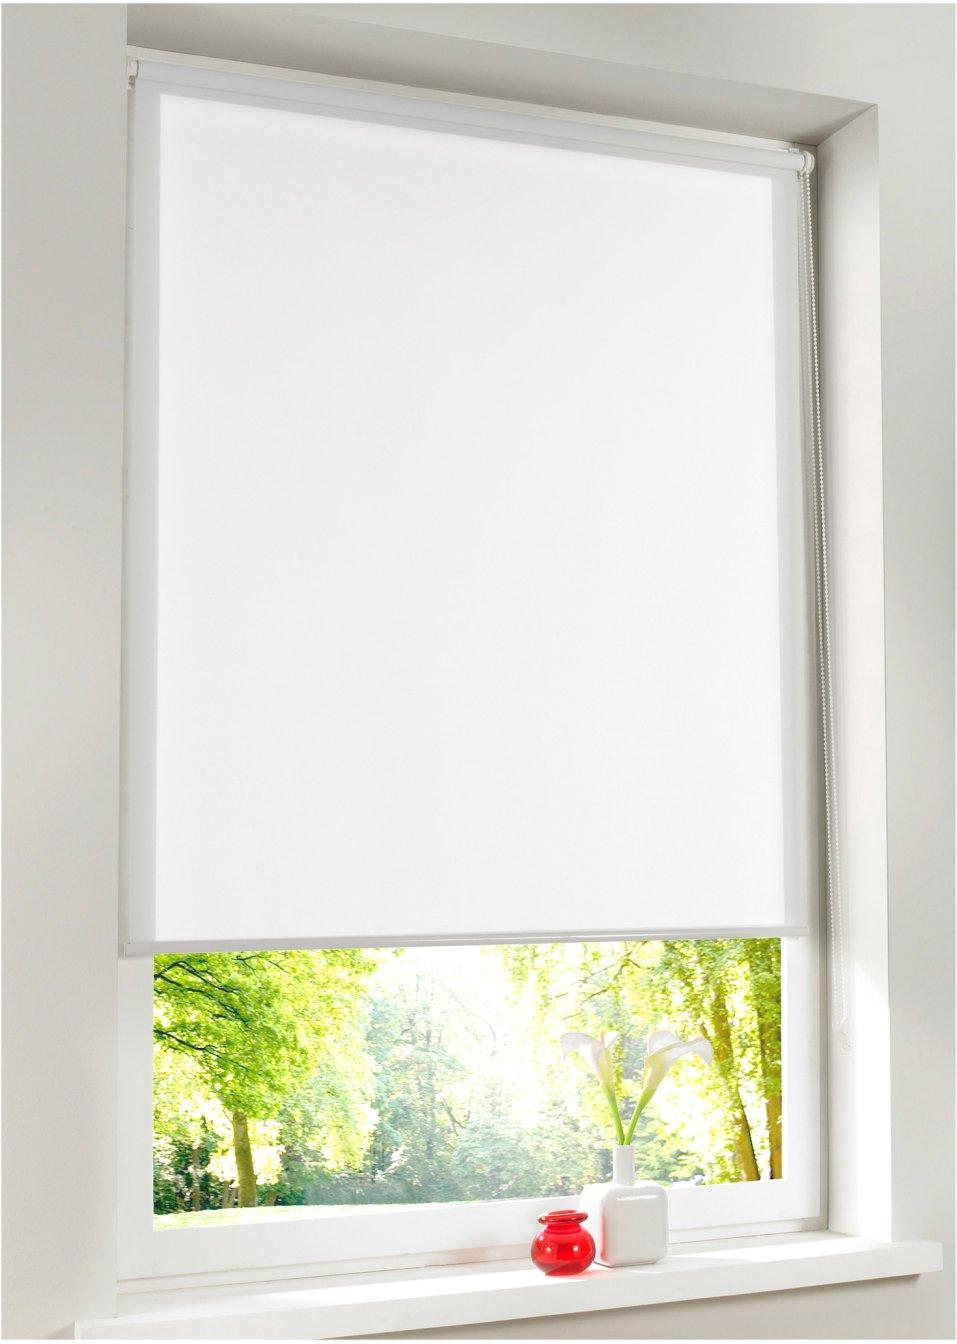 Tenda a rullo klemmfix bianco casa - Bonprix casa tende ...